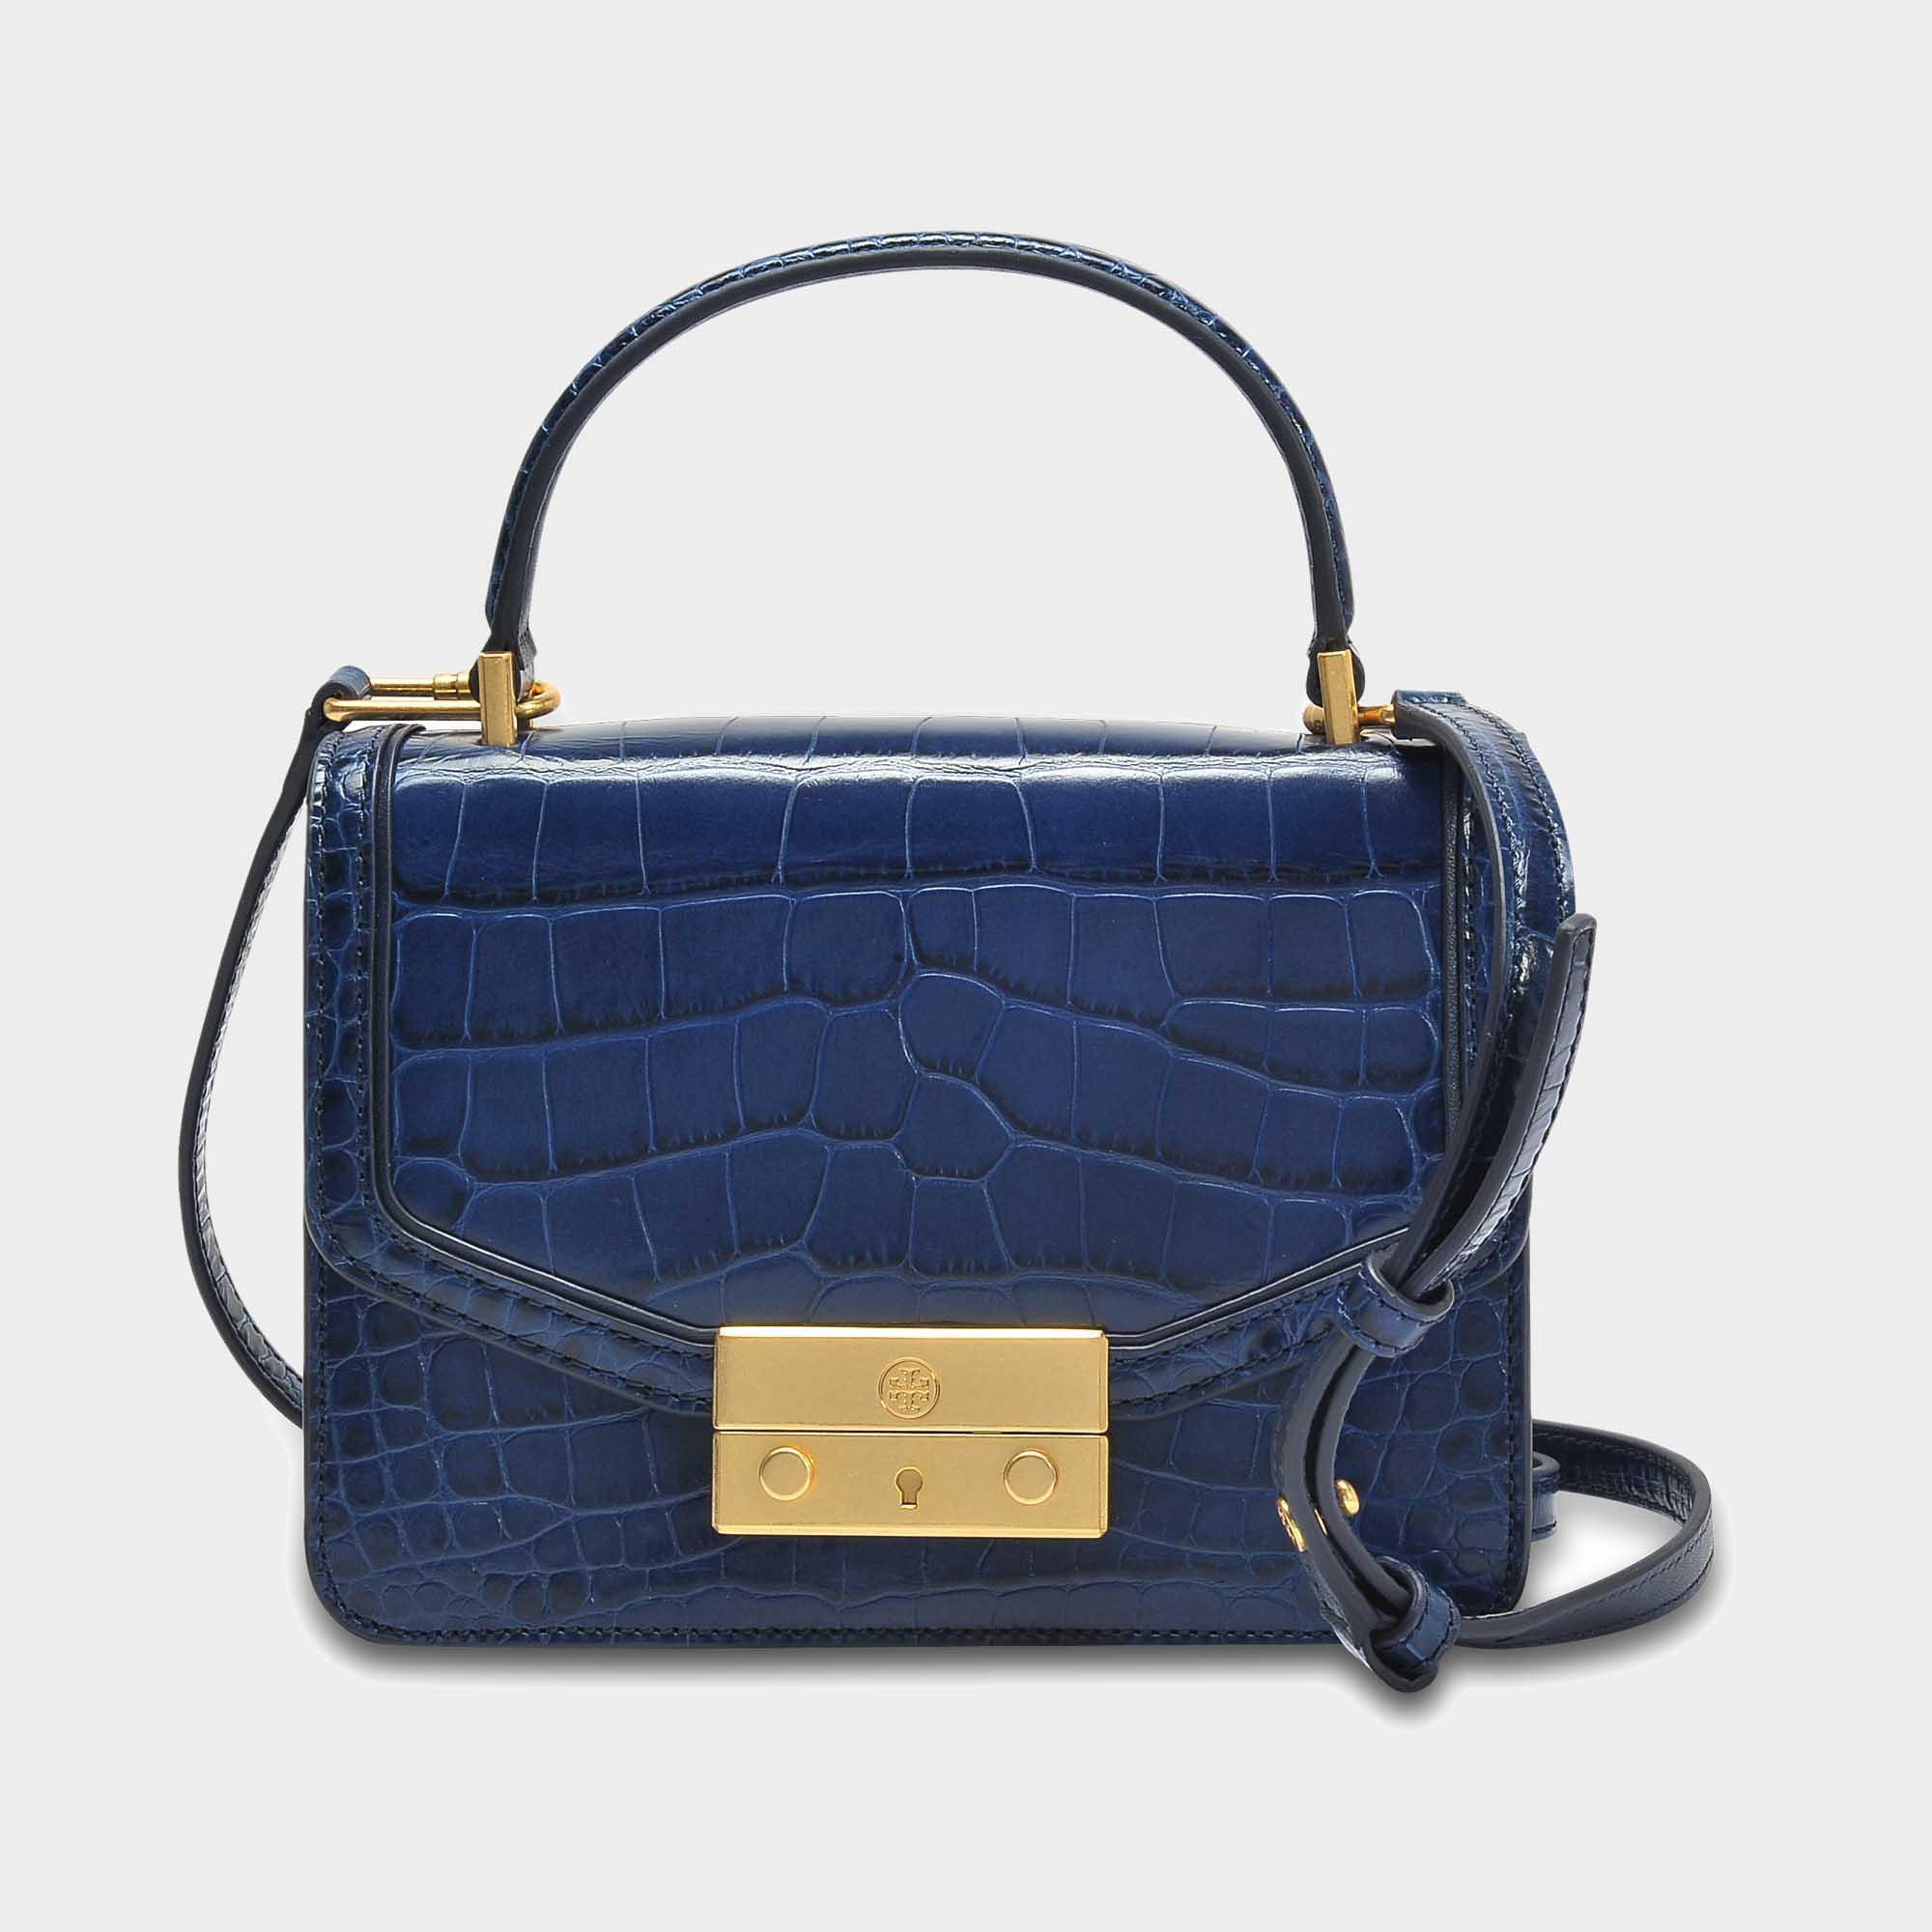 fc4f4d50819 Lyst - Tory Burch Juliette Croc Mini Top Handle Satchel Bag In Tory ...